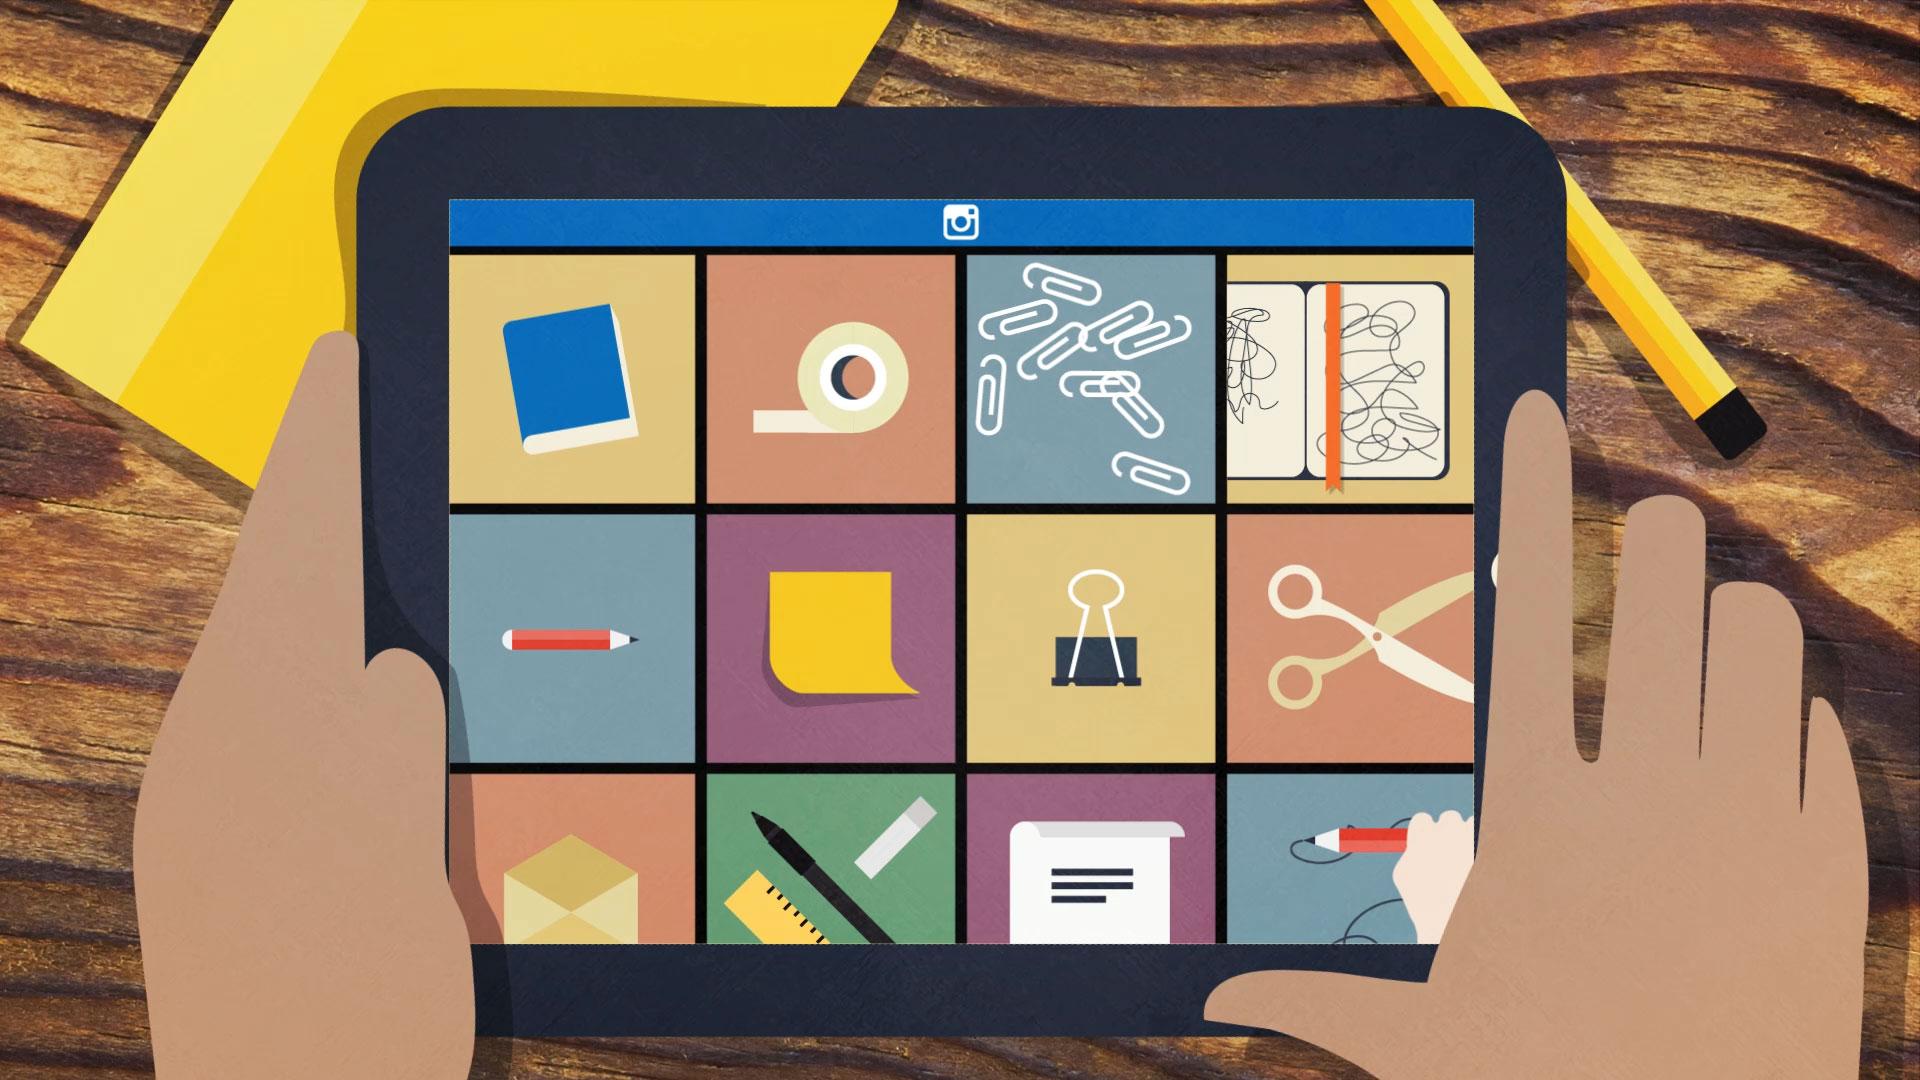 Marketing Service - Product explainer video image